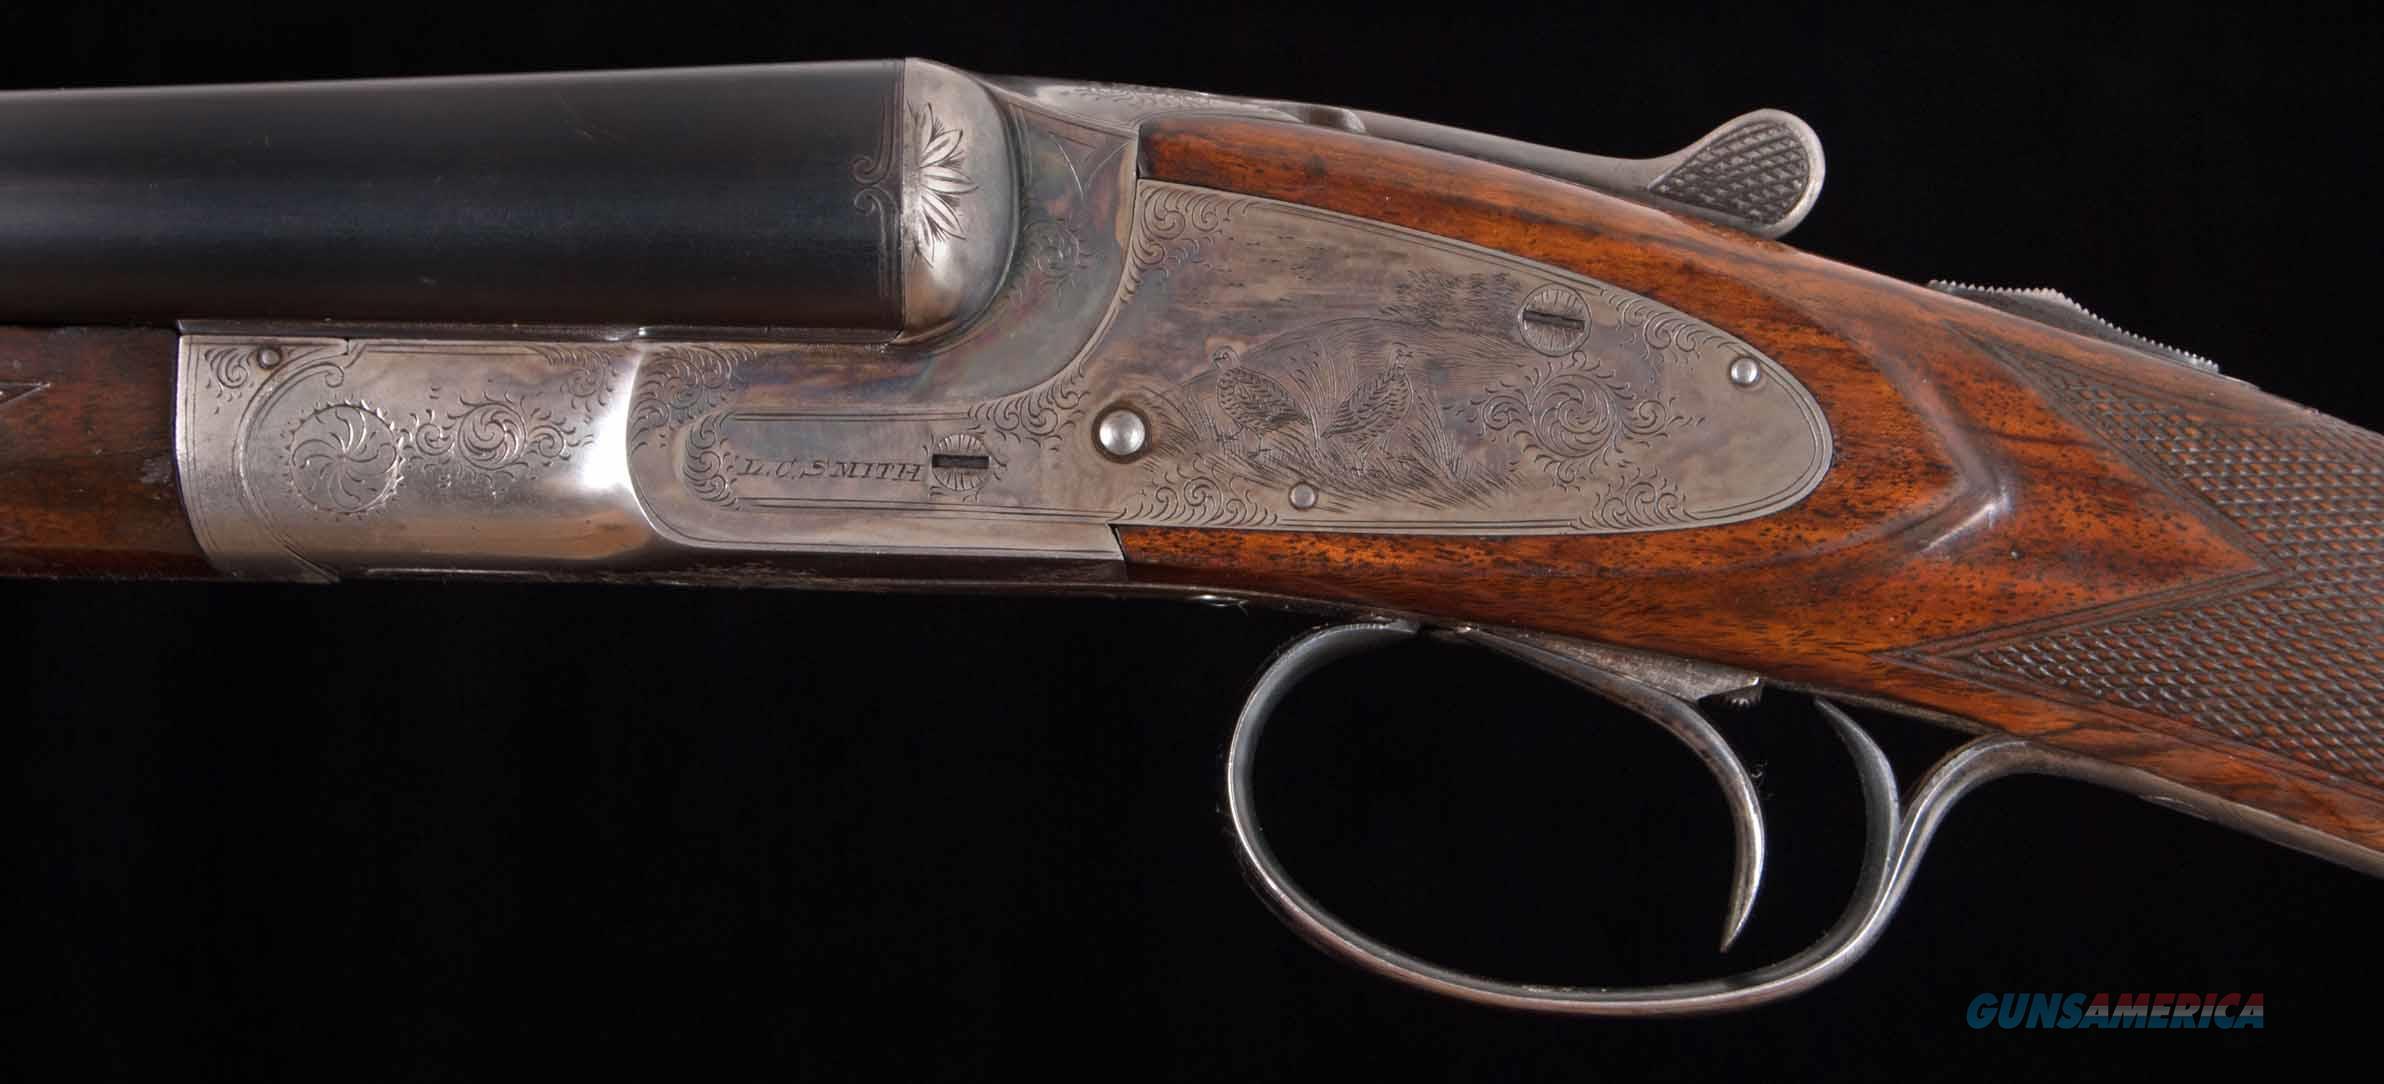 "L.C. Smith 3E 20ga - 1 OF 143, 38 WITH 30"" BARRELS 85% CASE COLOR, vintage firearms inc  Guns > Shotguns > L.C. Smith Shotguns"